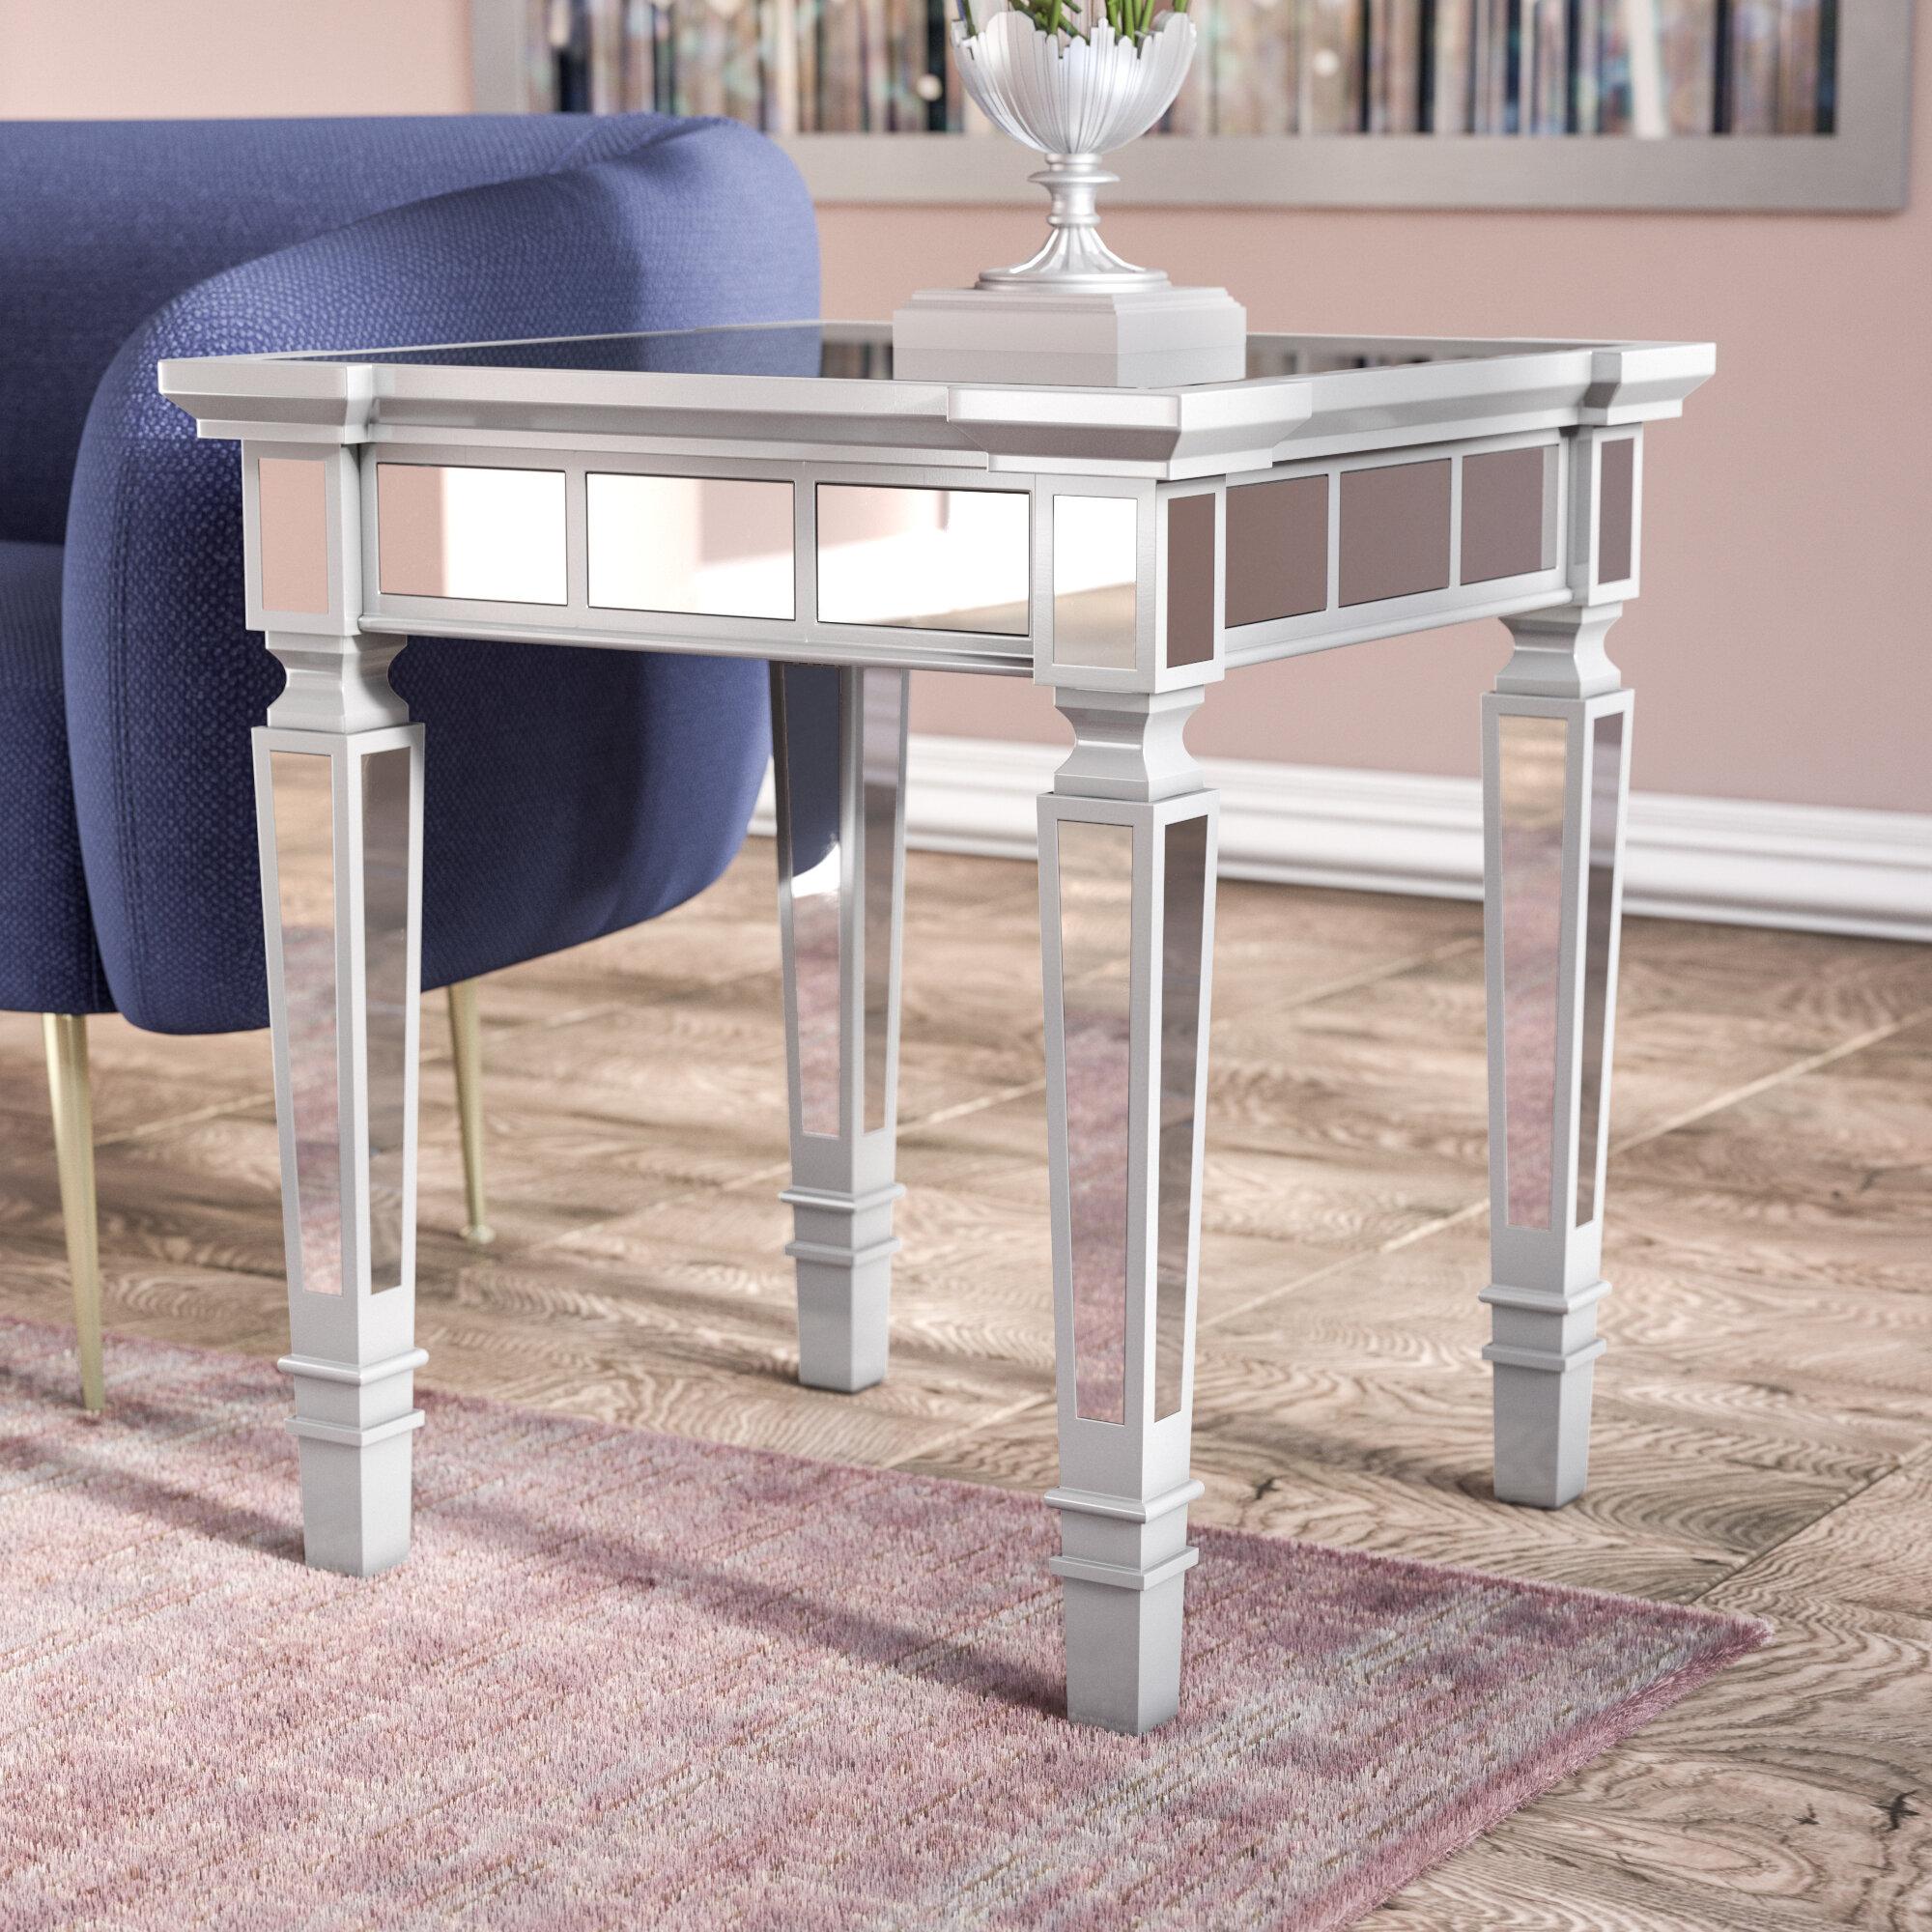 Willa Arlo Interiors Jerlene Glam Mirrored Square End Table